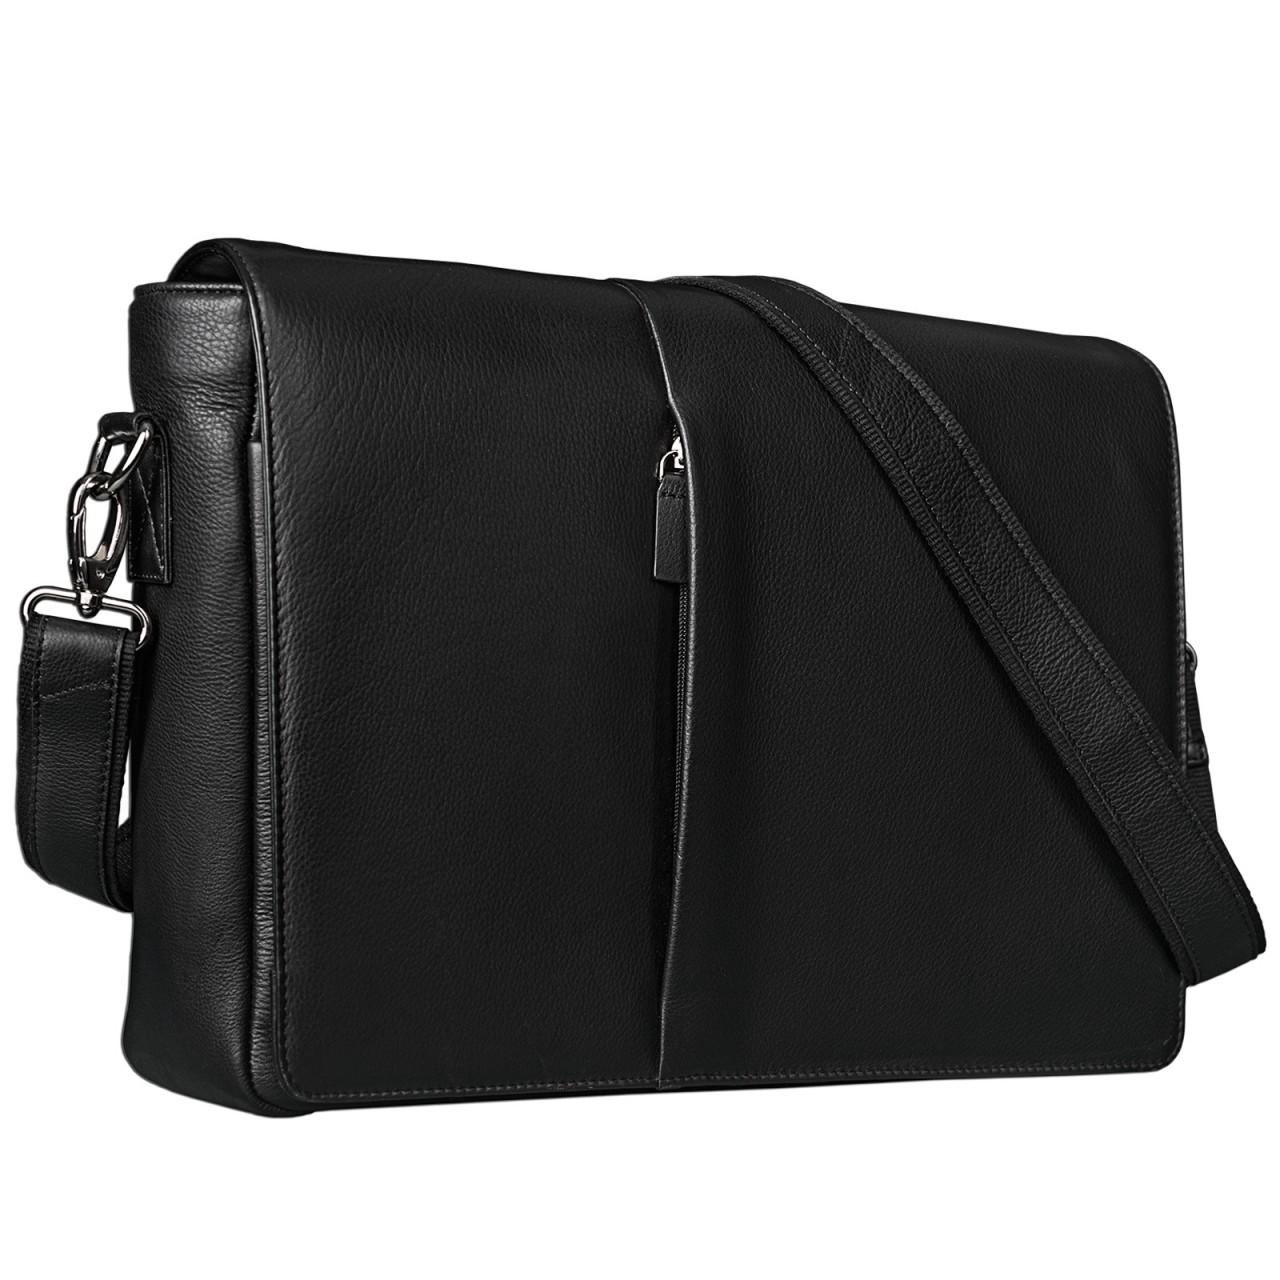 STILORD Ledertasche Umhängetasche Herren Damen Aktentasche Uni Messenger Bag Büro Office 15,6 Zoll Rinds Leder schwarz - Bild 1